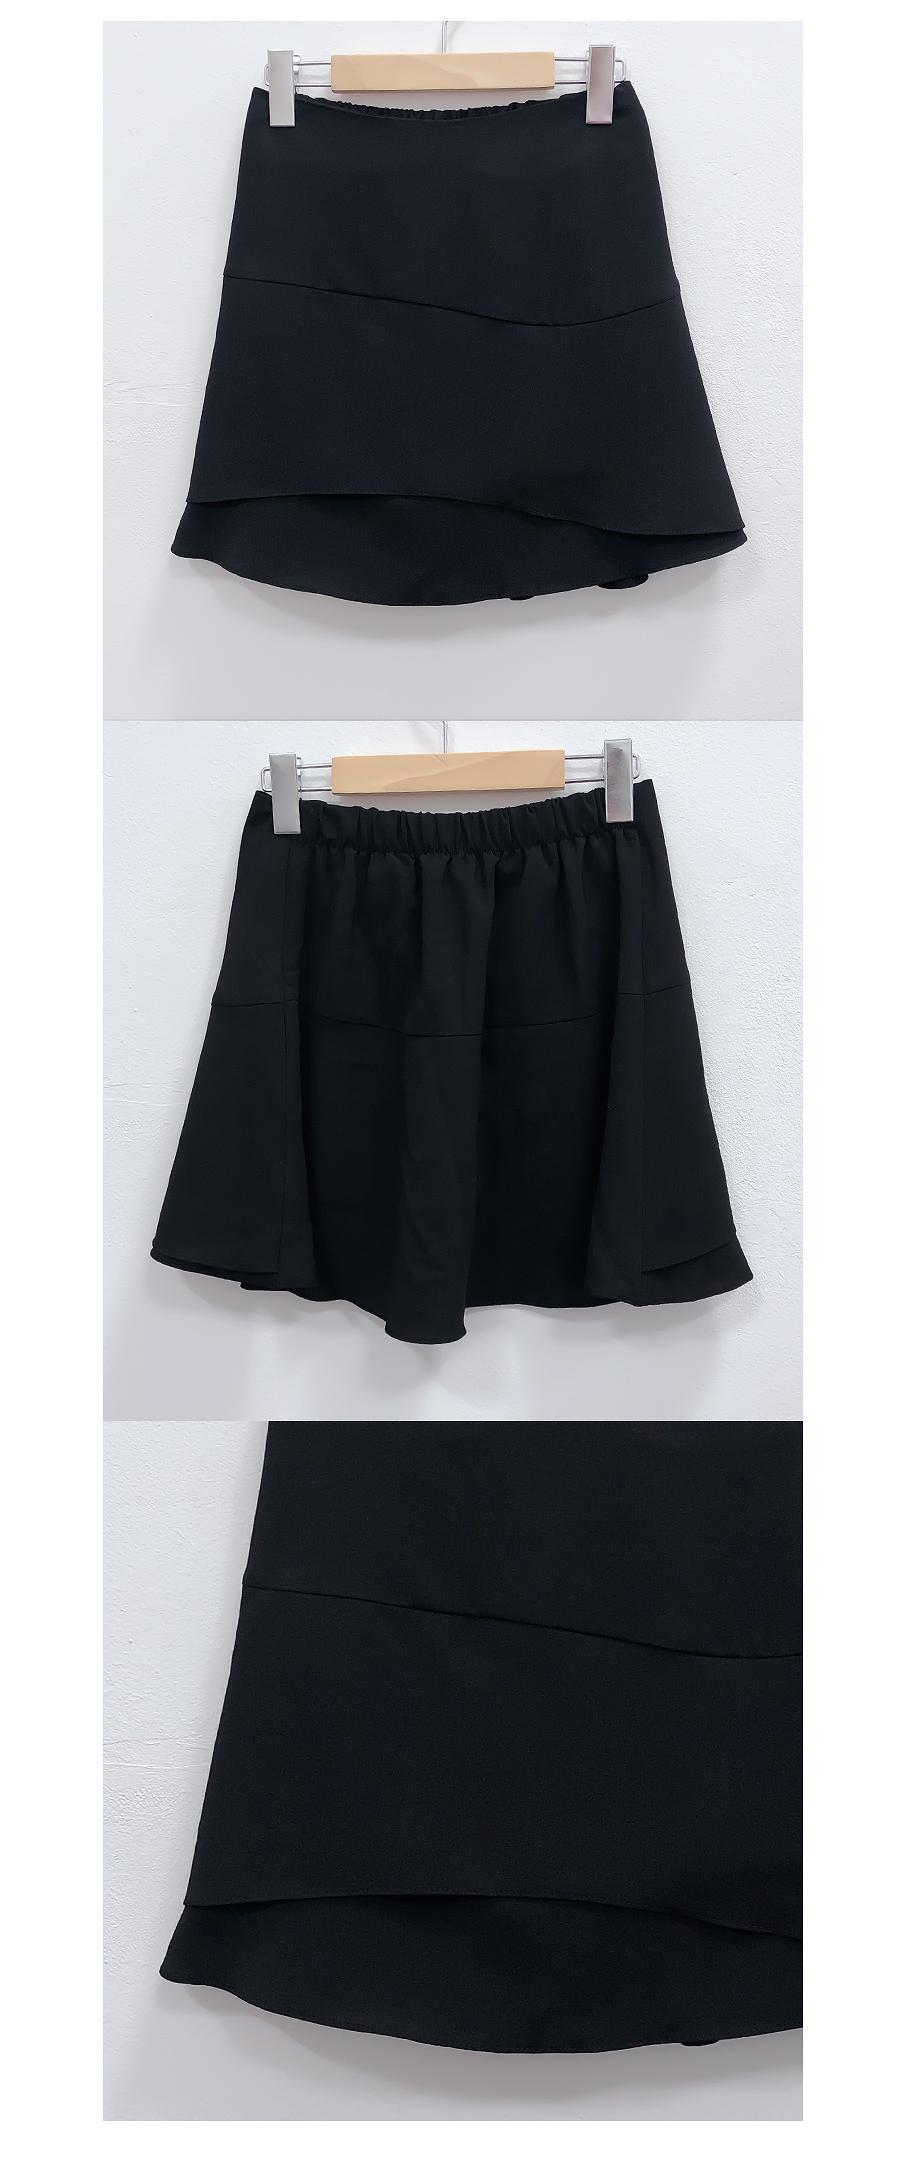 Wavy line flared skirt pants